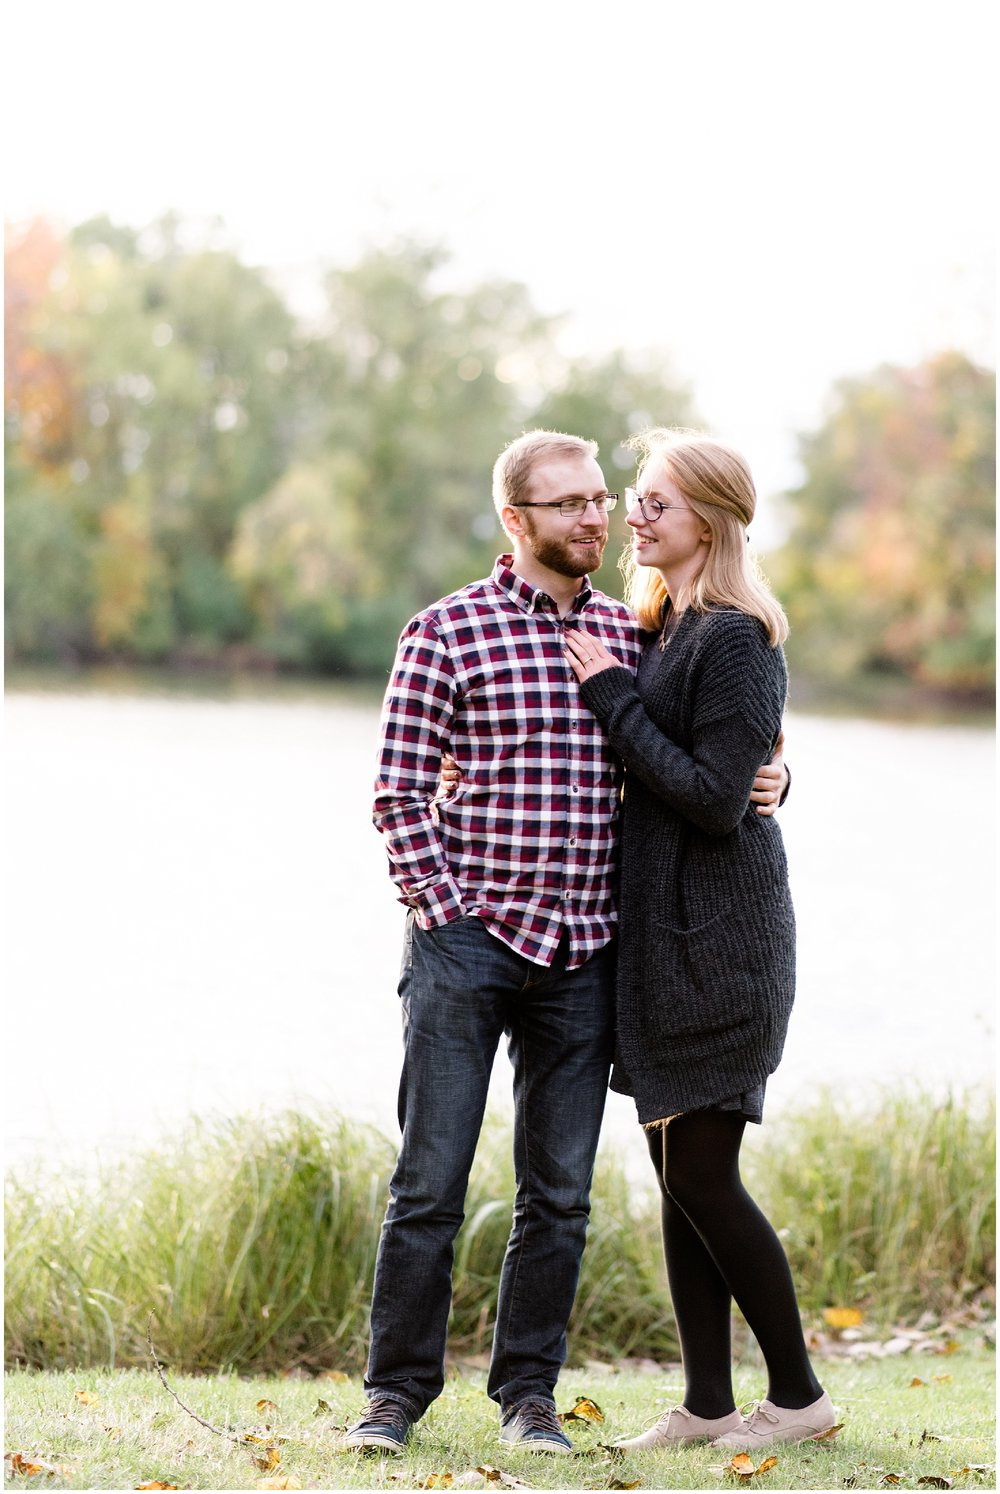 Weddings_by_Raisa_Photography_Grand_Rapids_October_Fall_Engagement_Milwaukee_Wisconsin_Photographer_0023.jpg